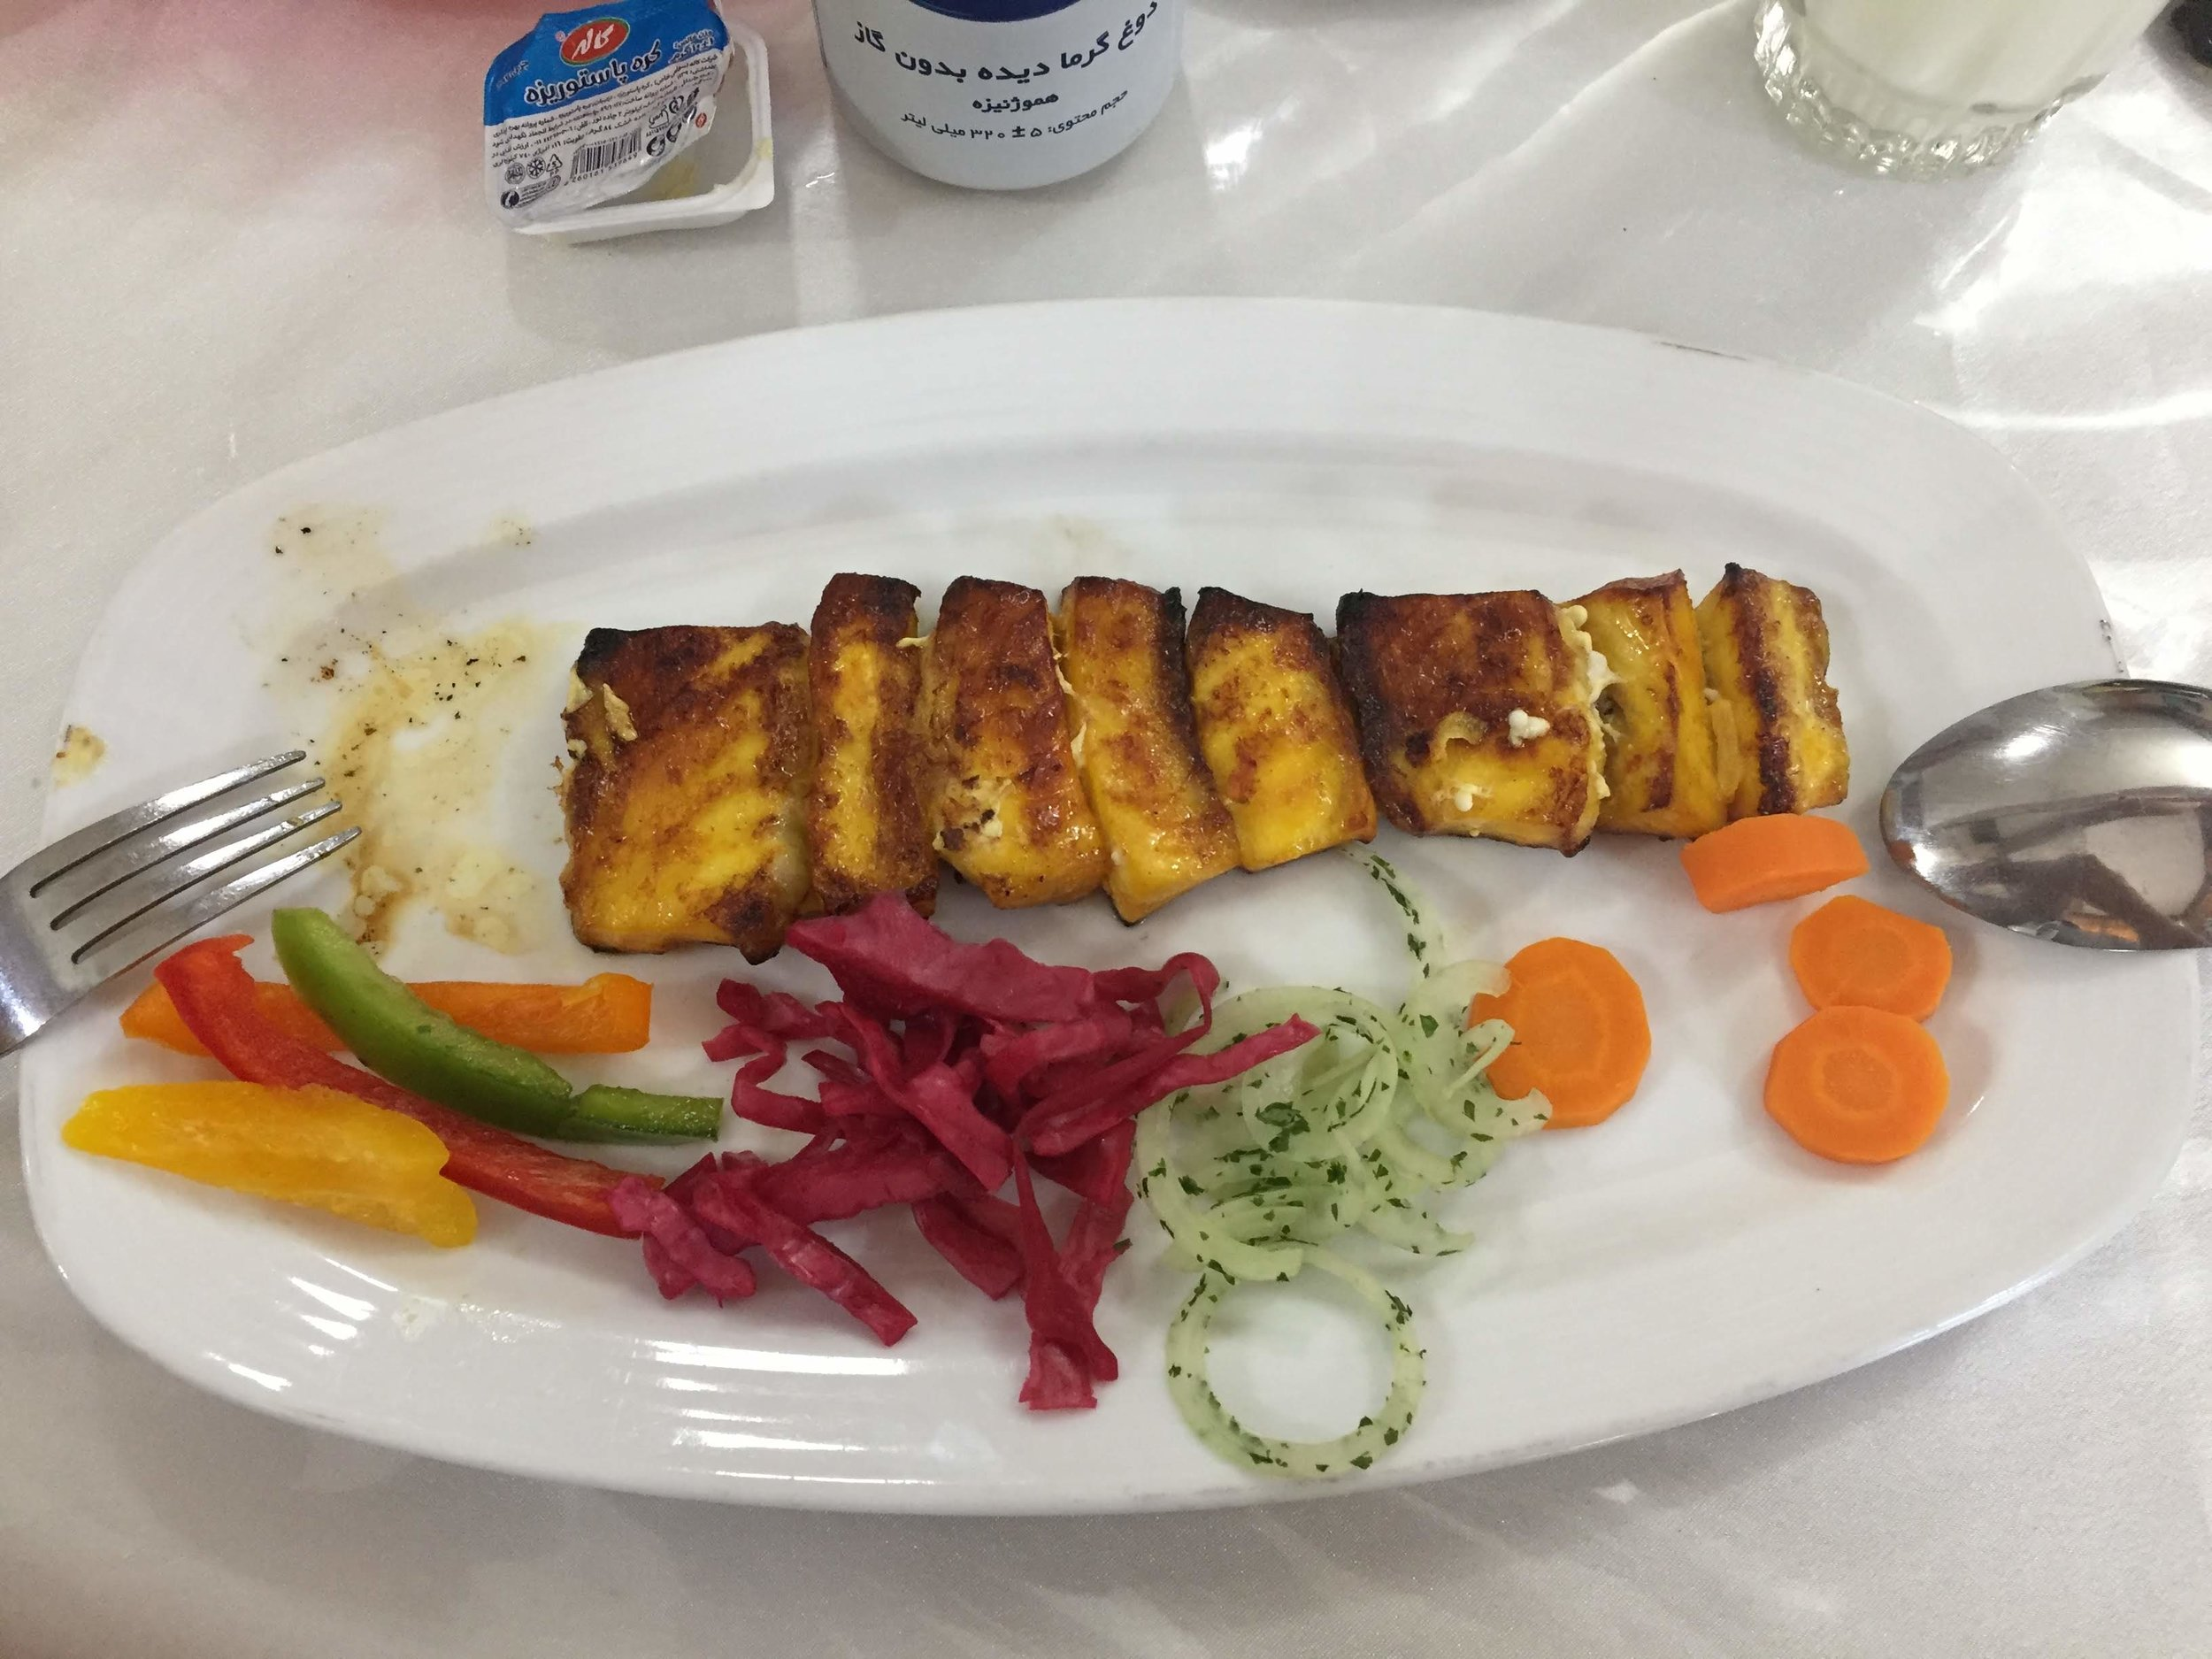 Delicious locally produced sturgeon dish in Bandar Abbas.